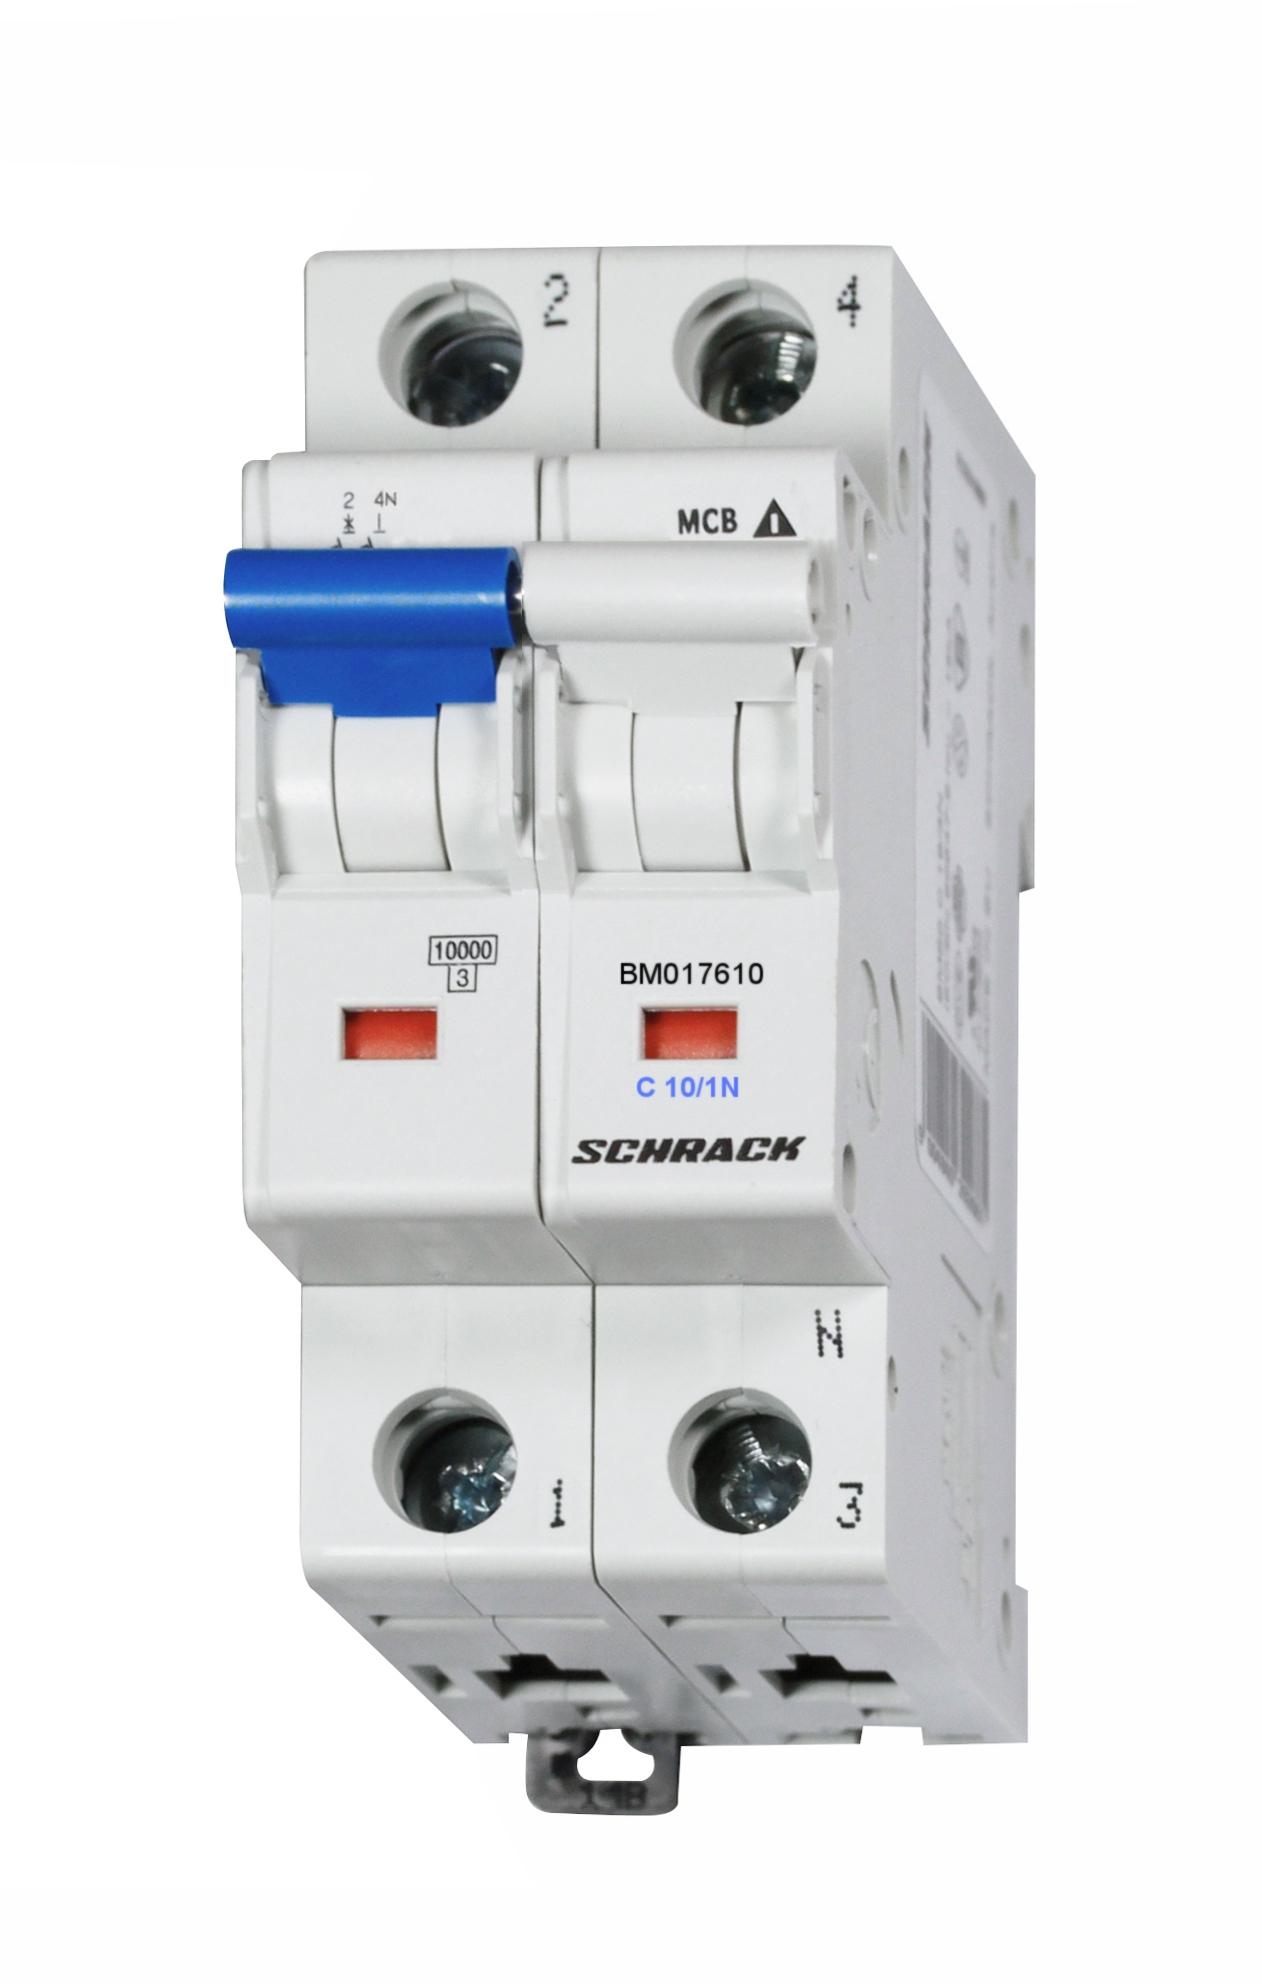 BM017610 - Schrack Technik